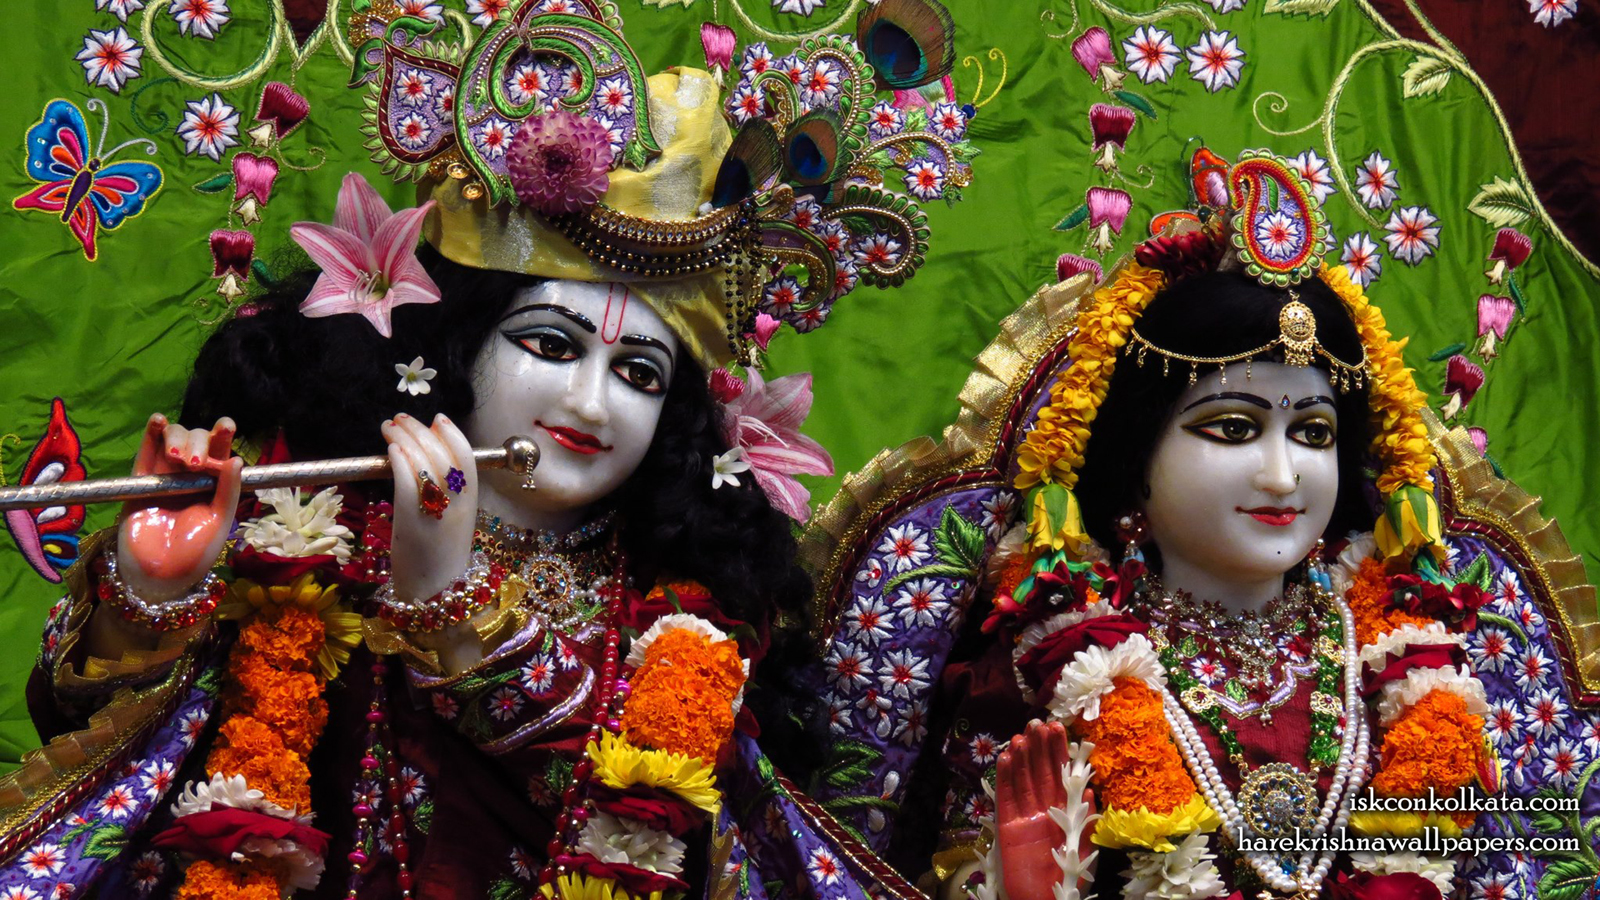 Sri Sri Radha Govinda Close up Wallpaper (005) Size 1600x900 Download